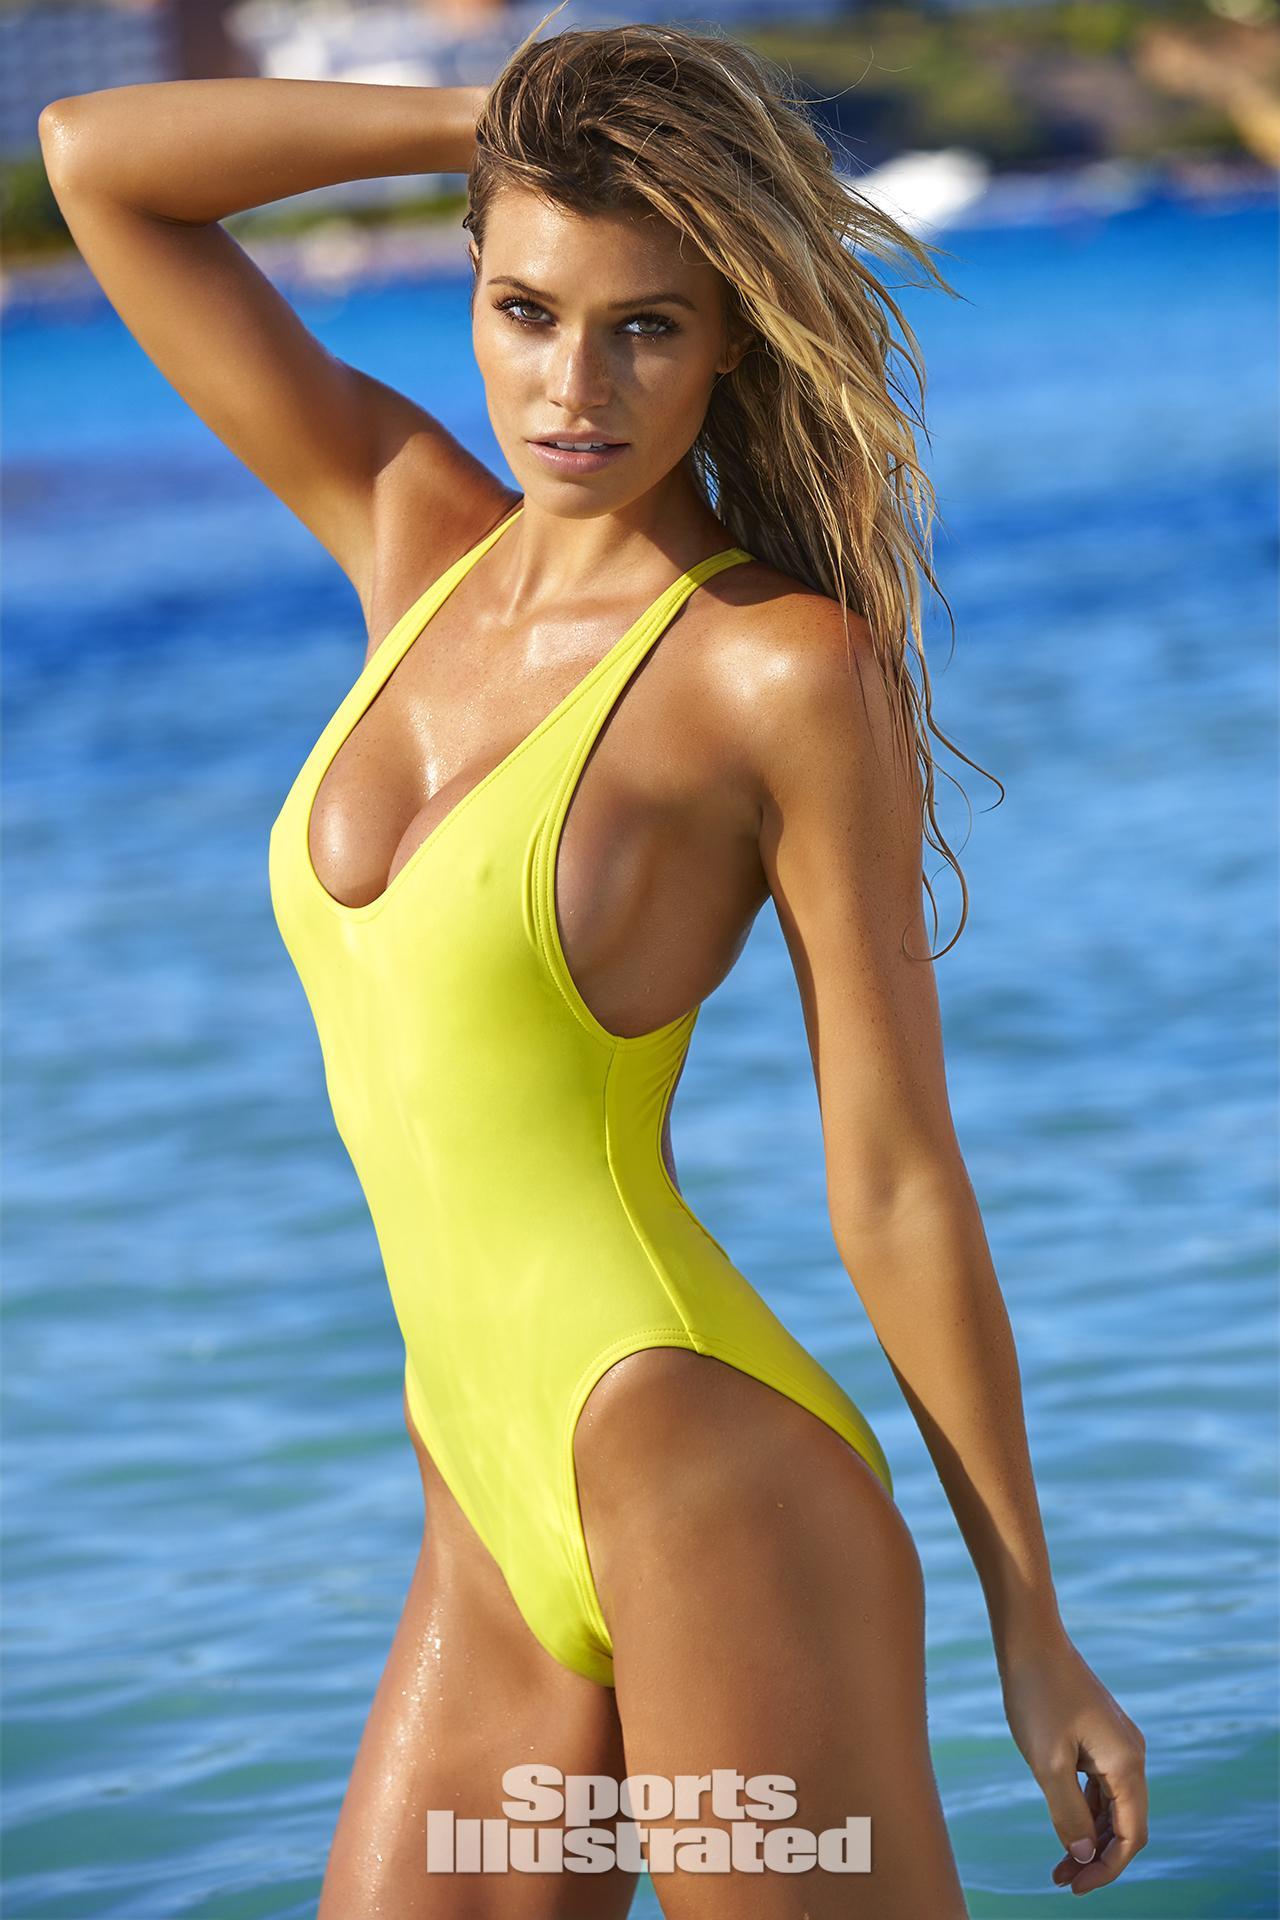 1145e3c3bb Samantha Hoopes Sports Illustrated Swimsuit 2016 16 1280x1920